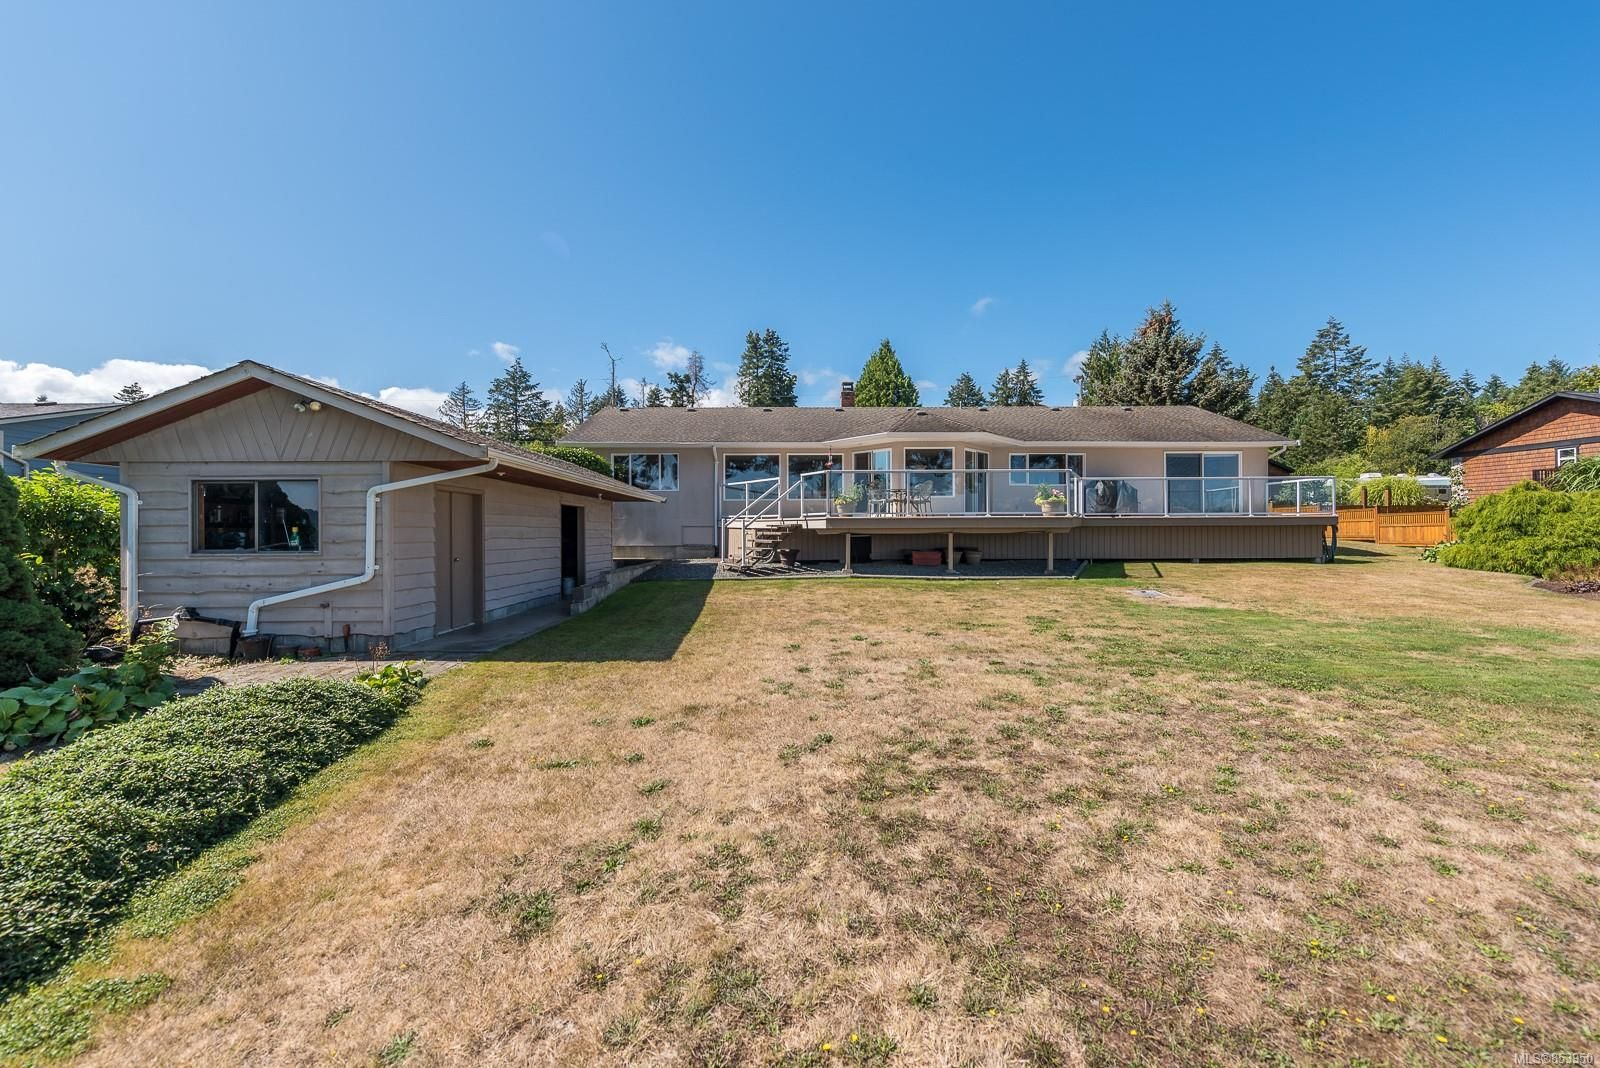 Photo 35: Photos: 5880 GARVIN Rd in : CV Union Bay/Fanny Bay House for sale (Comox Valley)  : MLS®# 853950